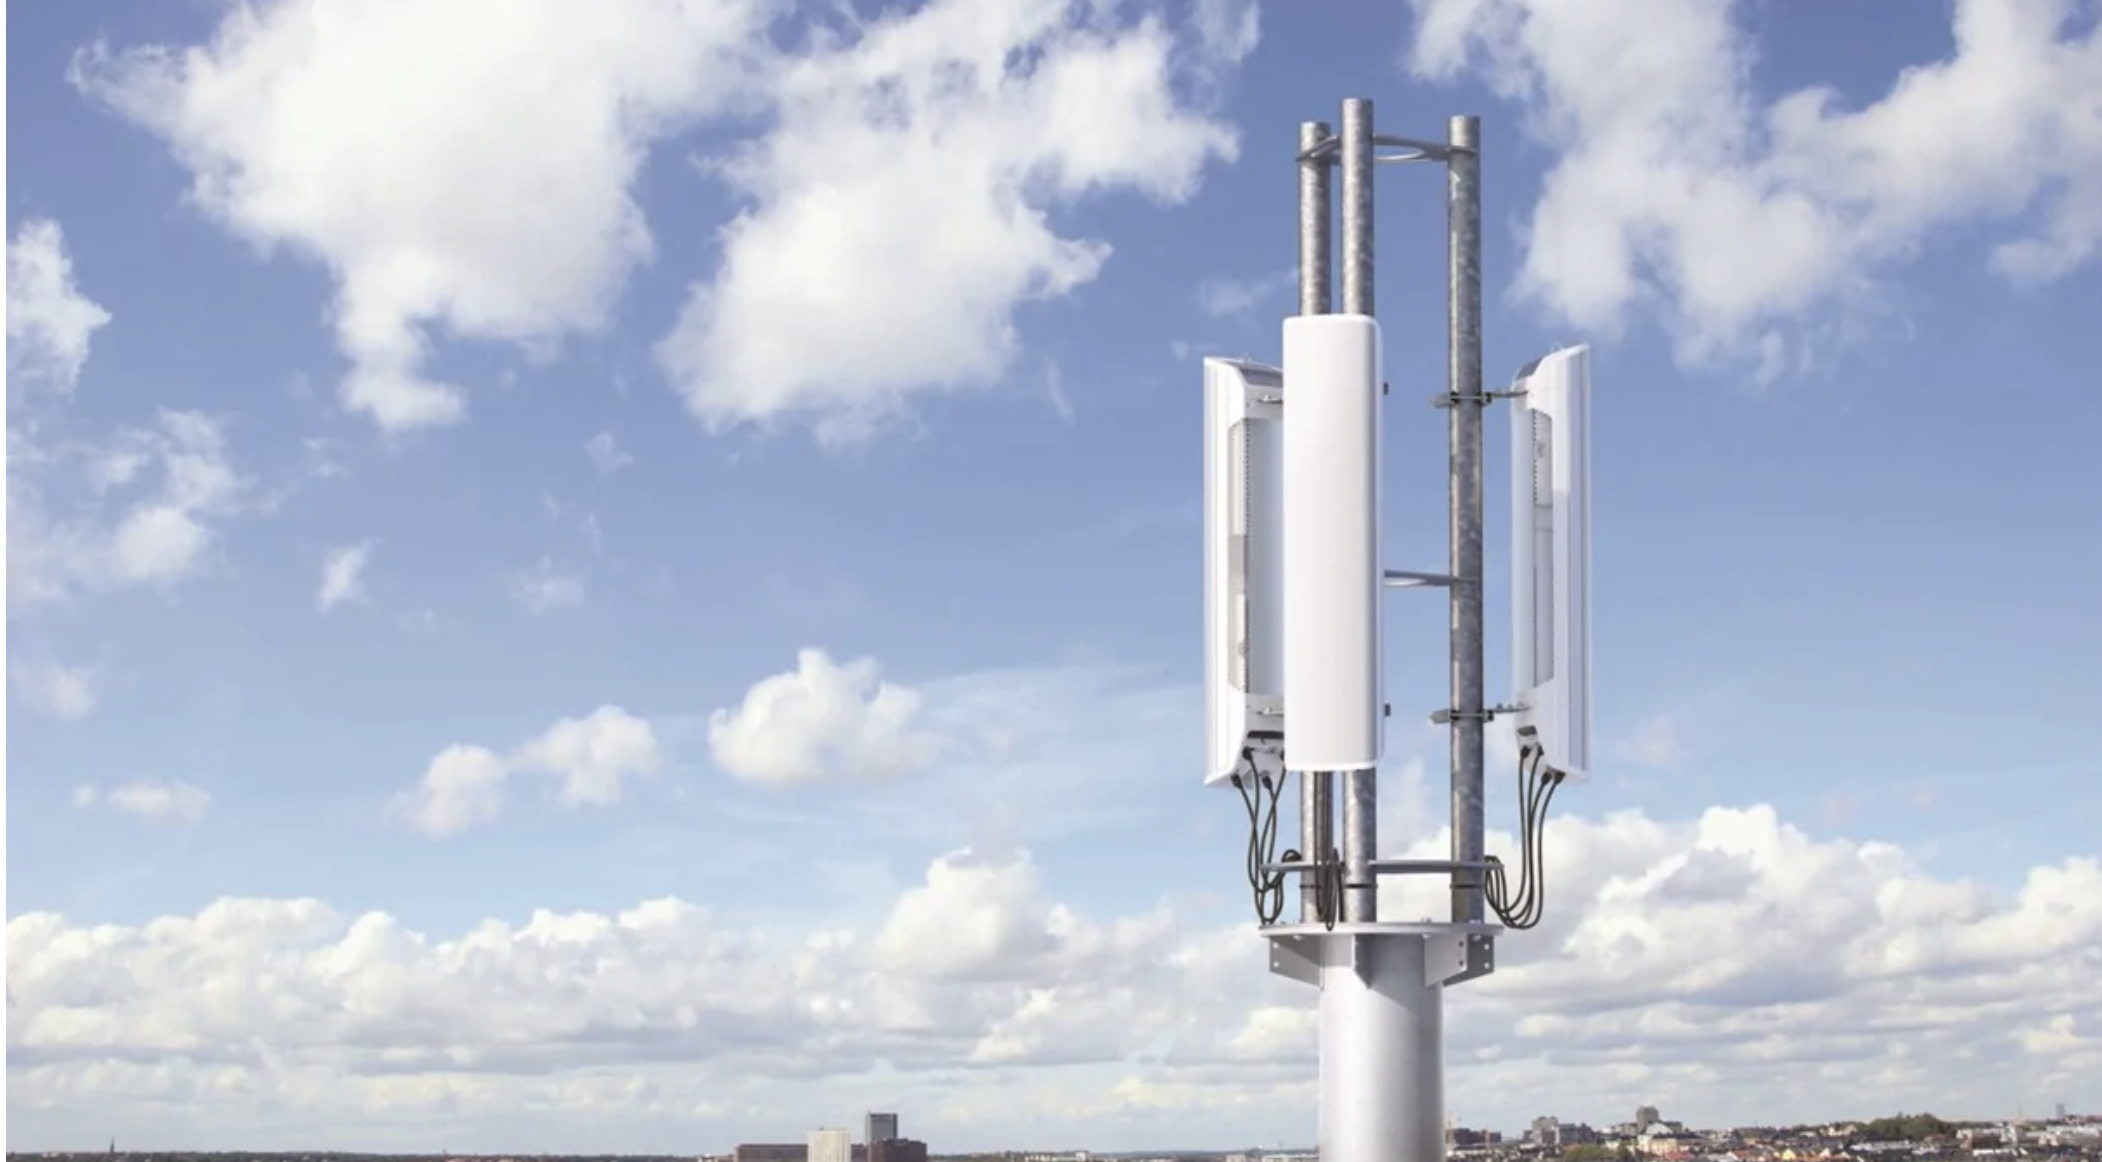 Wireless Provider